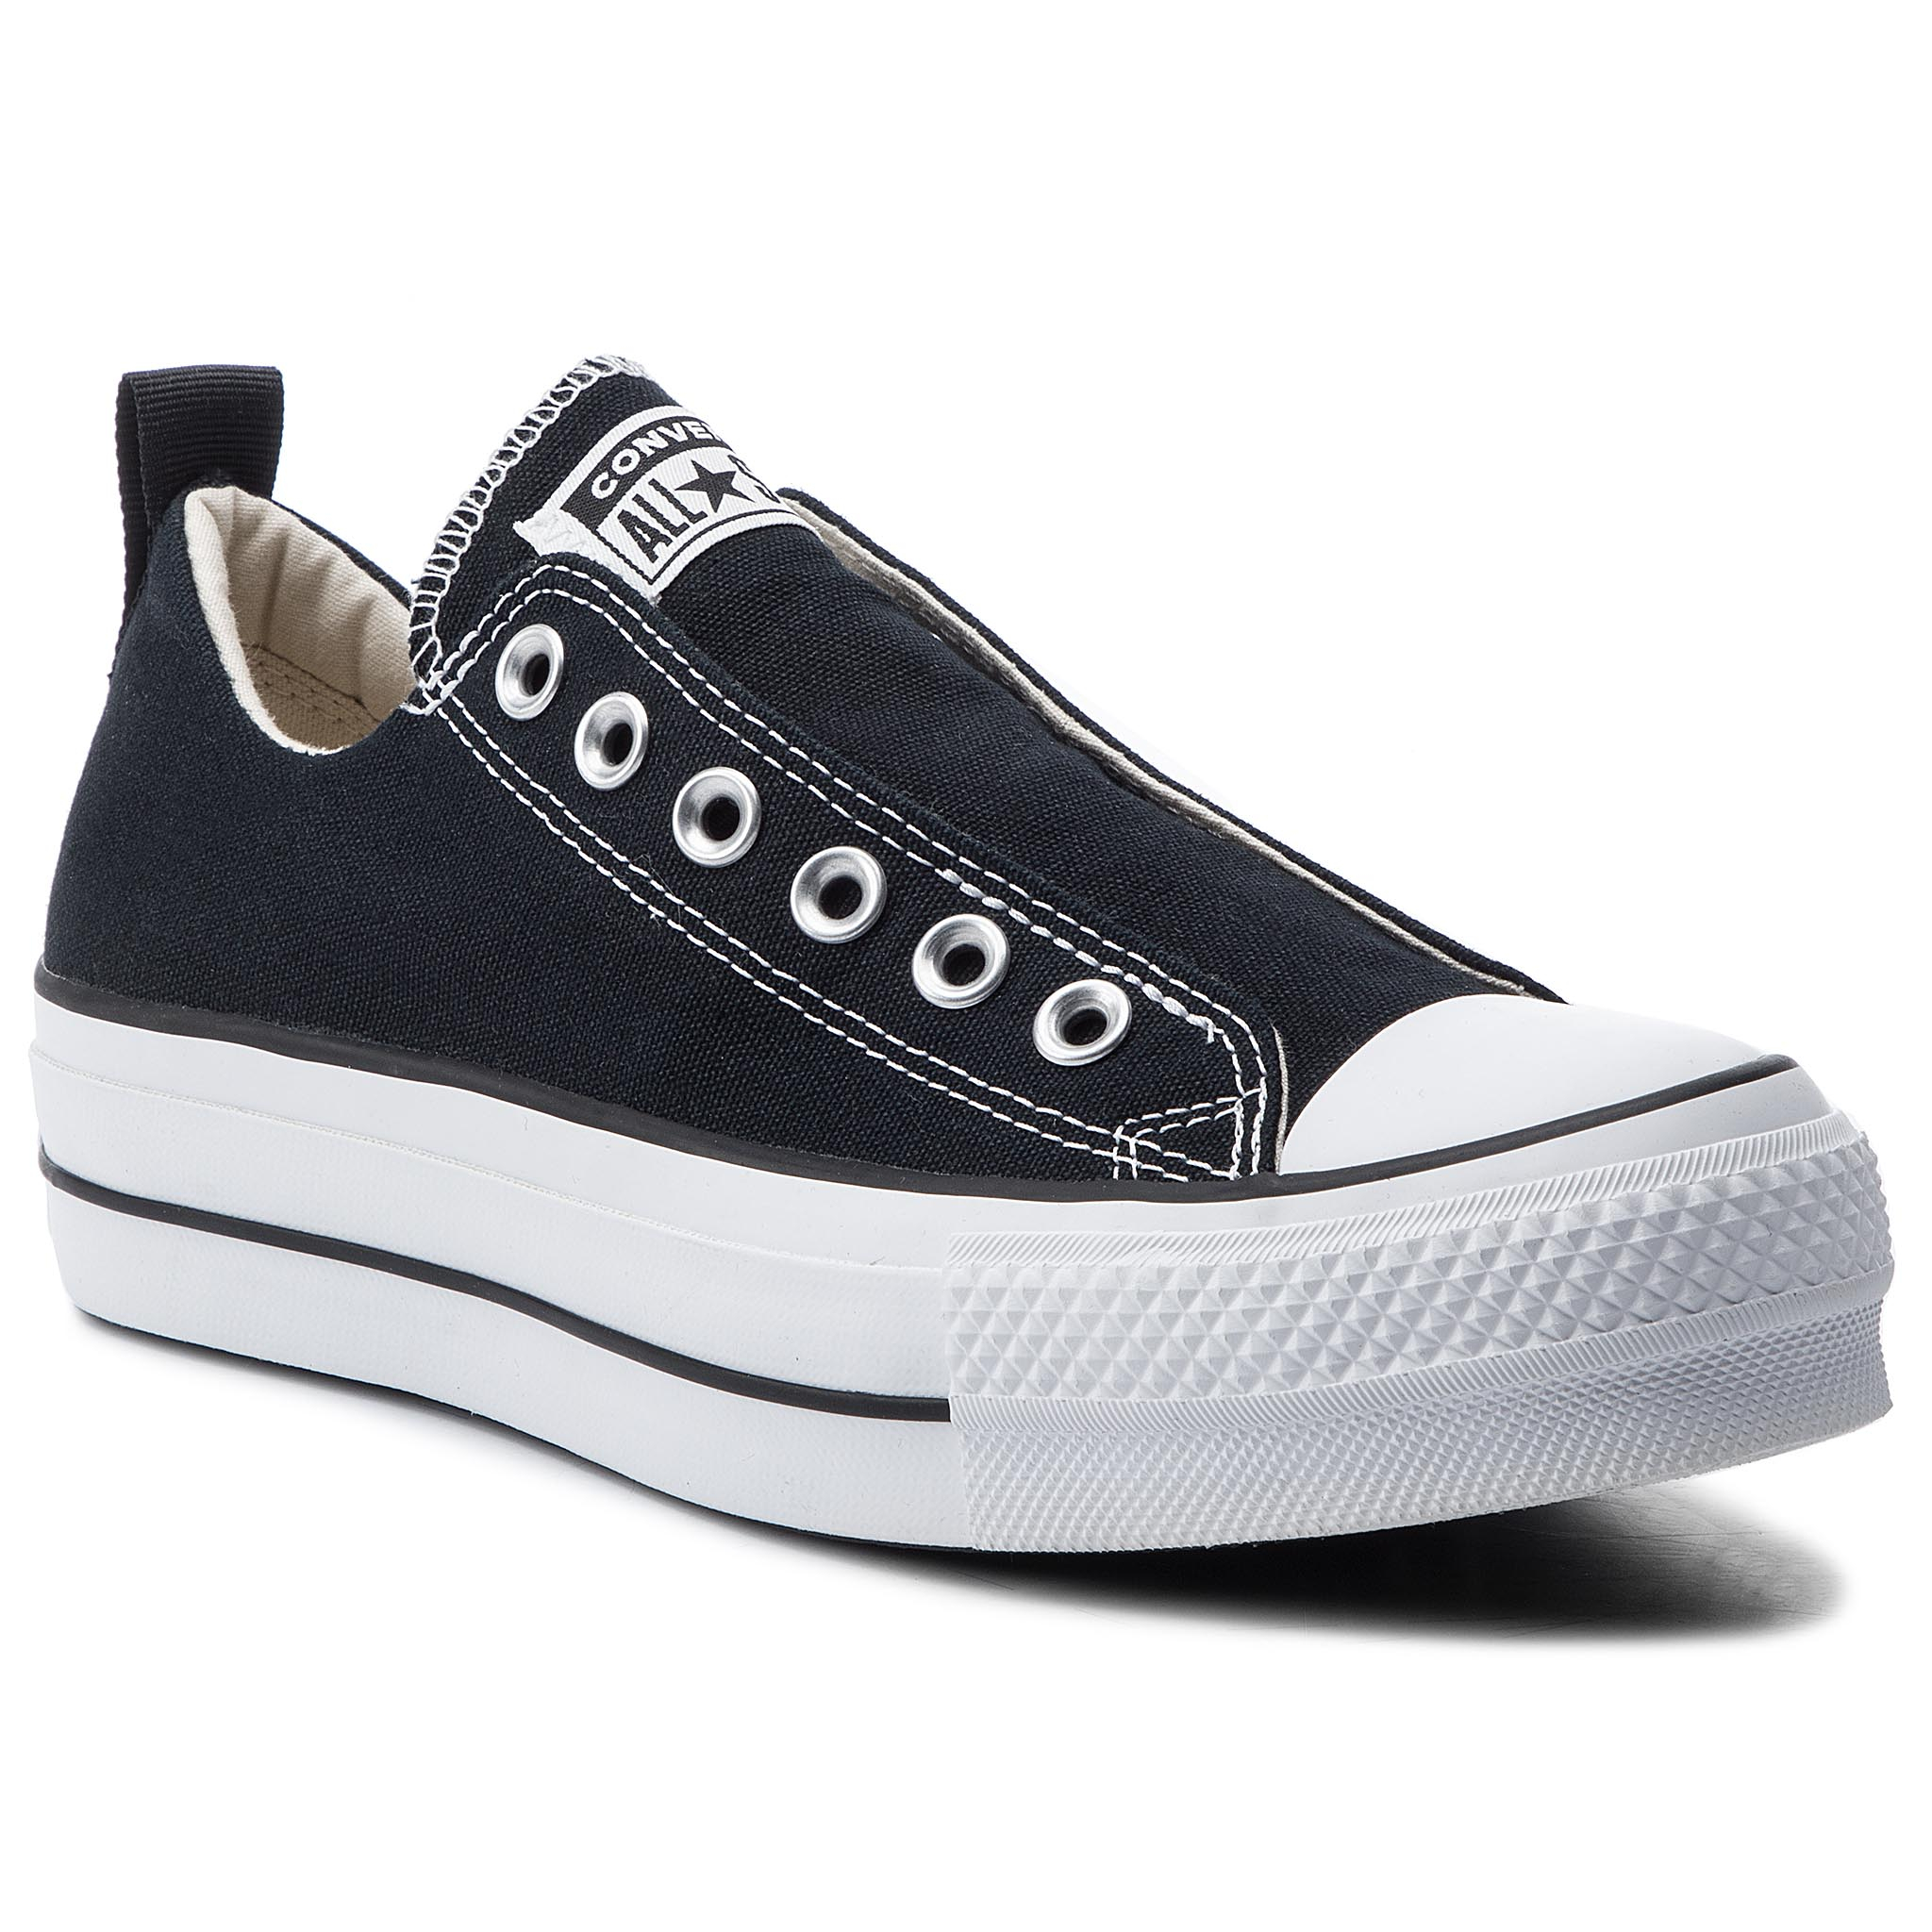 fd48741826fc3 Tramky CONVERSE - Ctas Fashion Ox 563456C Black/White/Black - Glami.sk